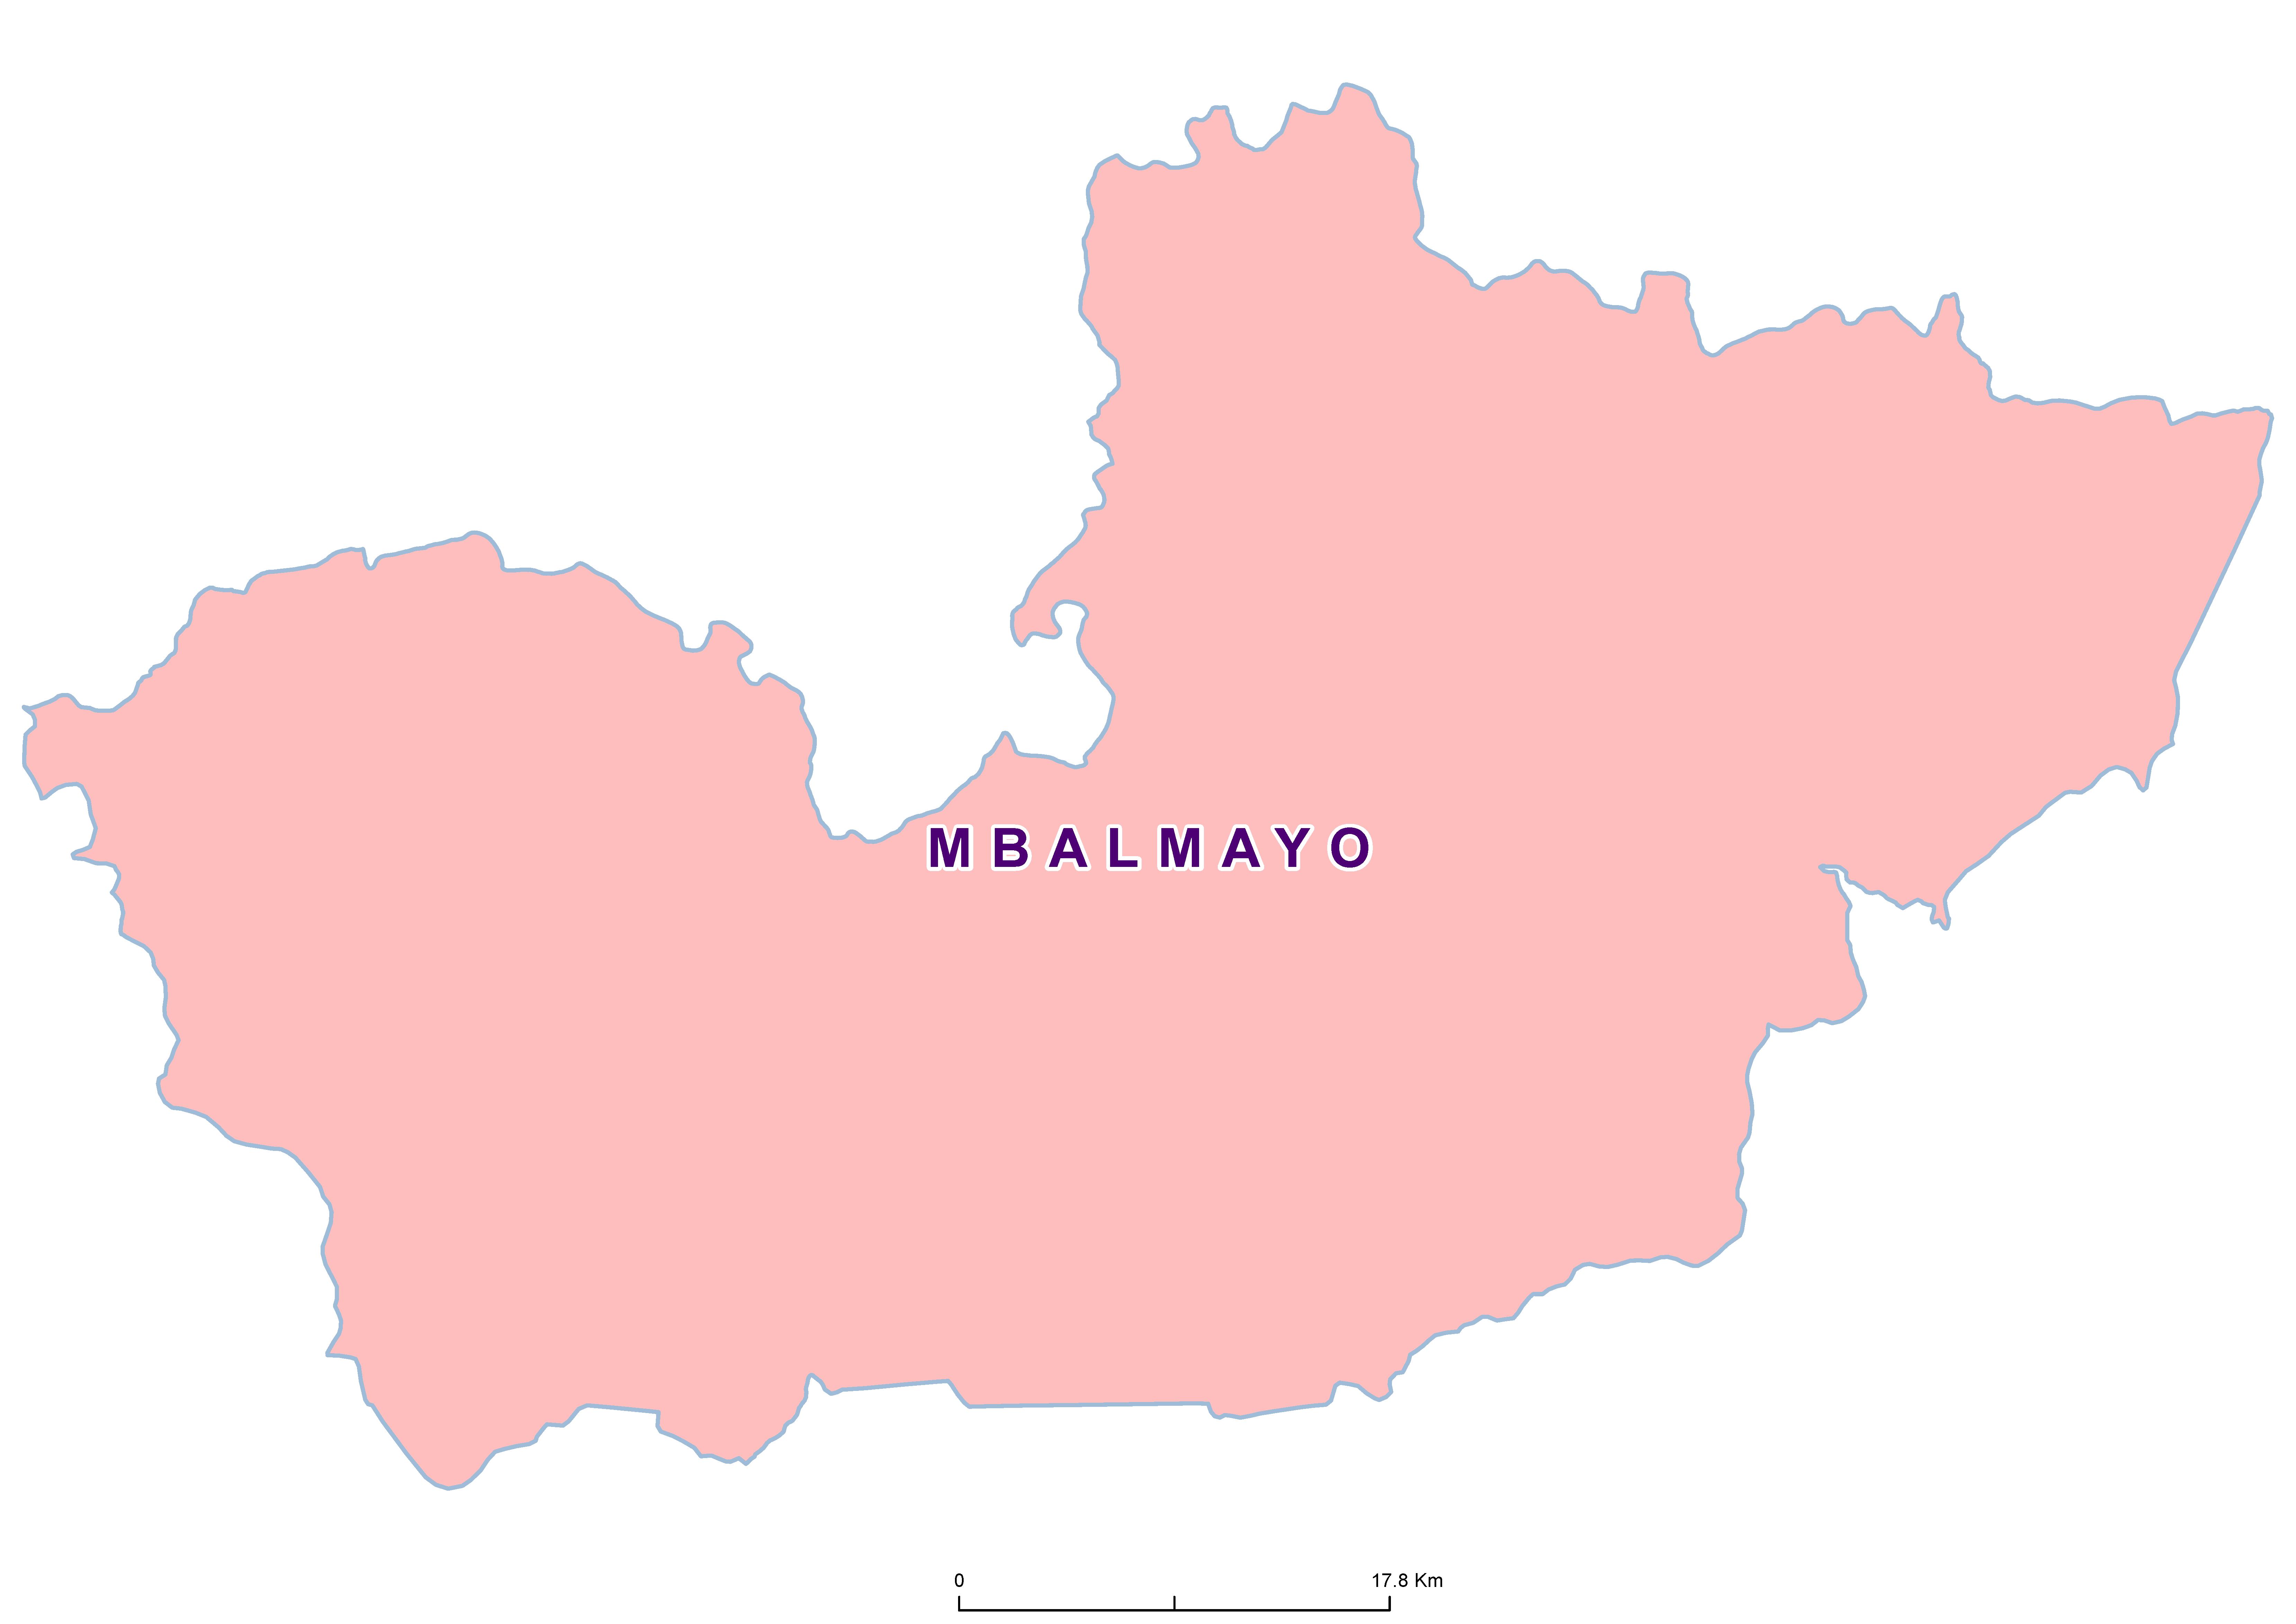 Mbalmayo Max SCH 20180001